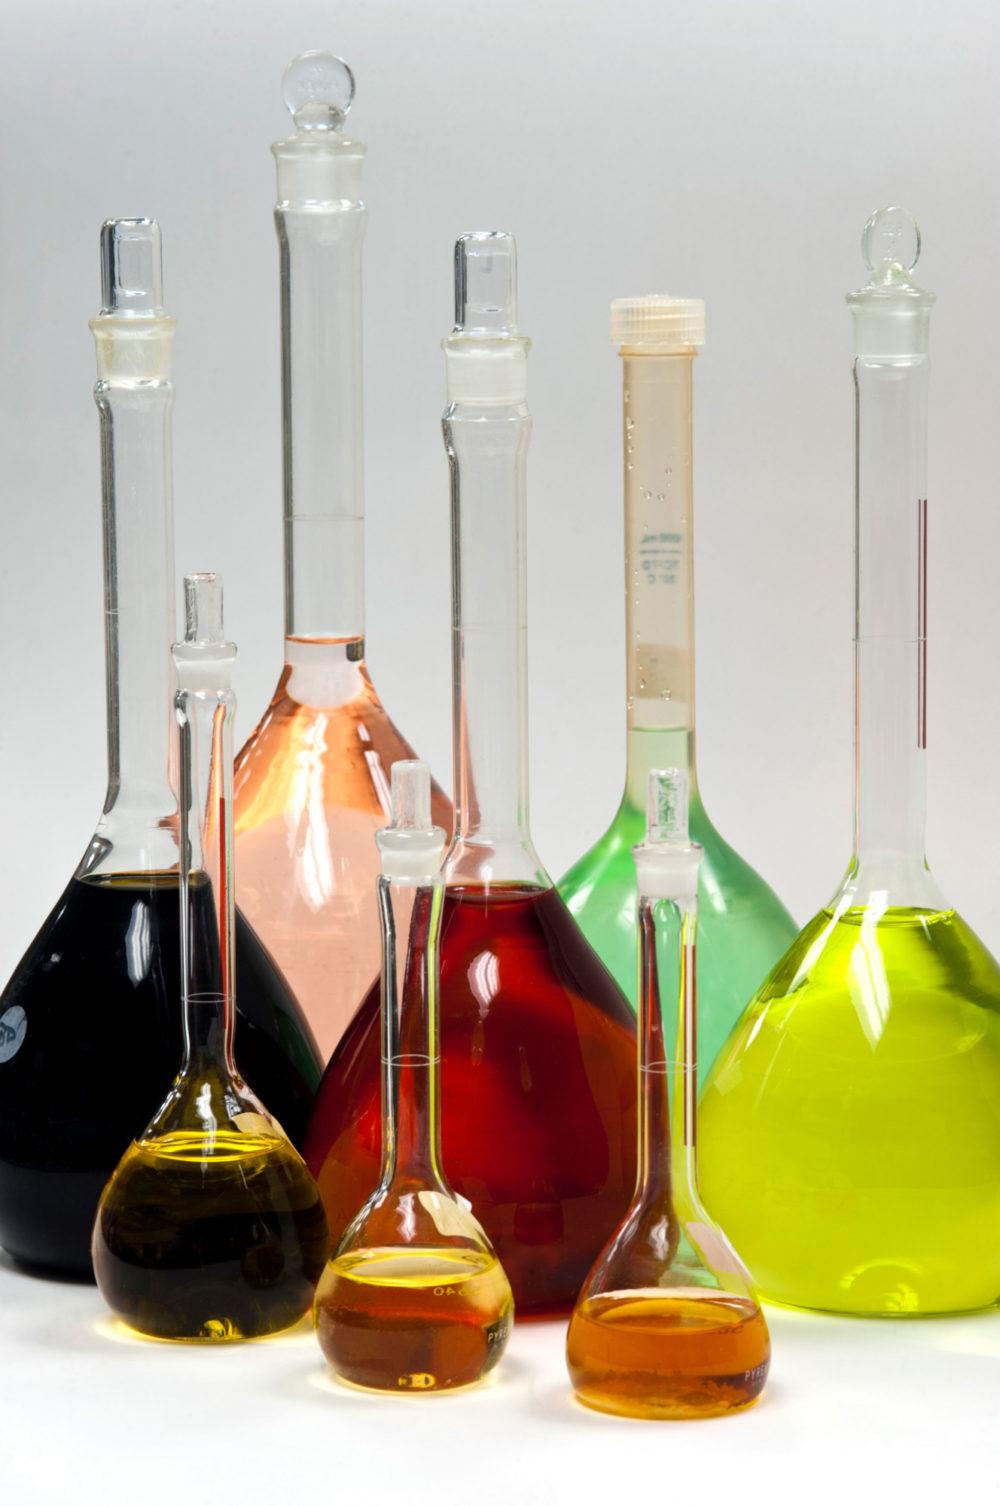 BASF Catalysts | Precious Metal Chemicals Lab Tubes